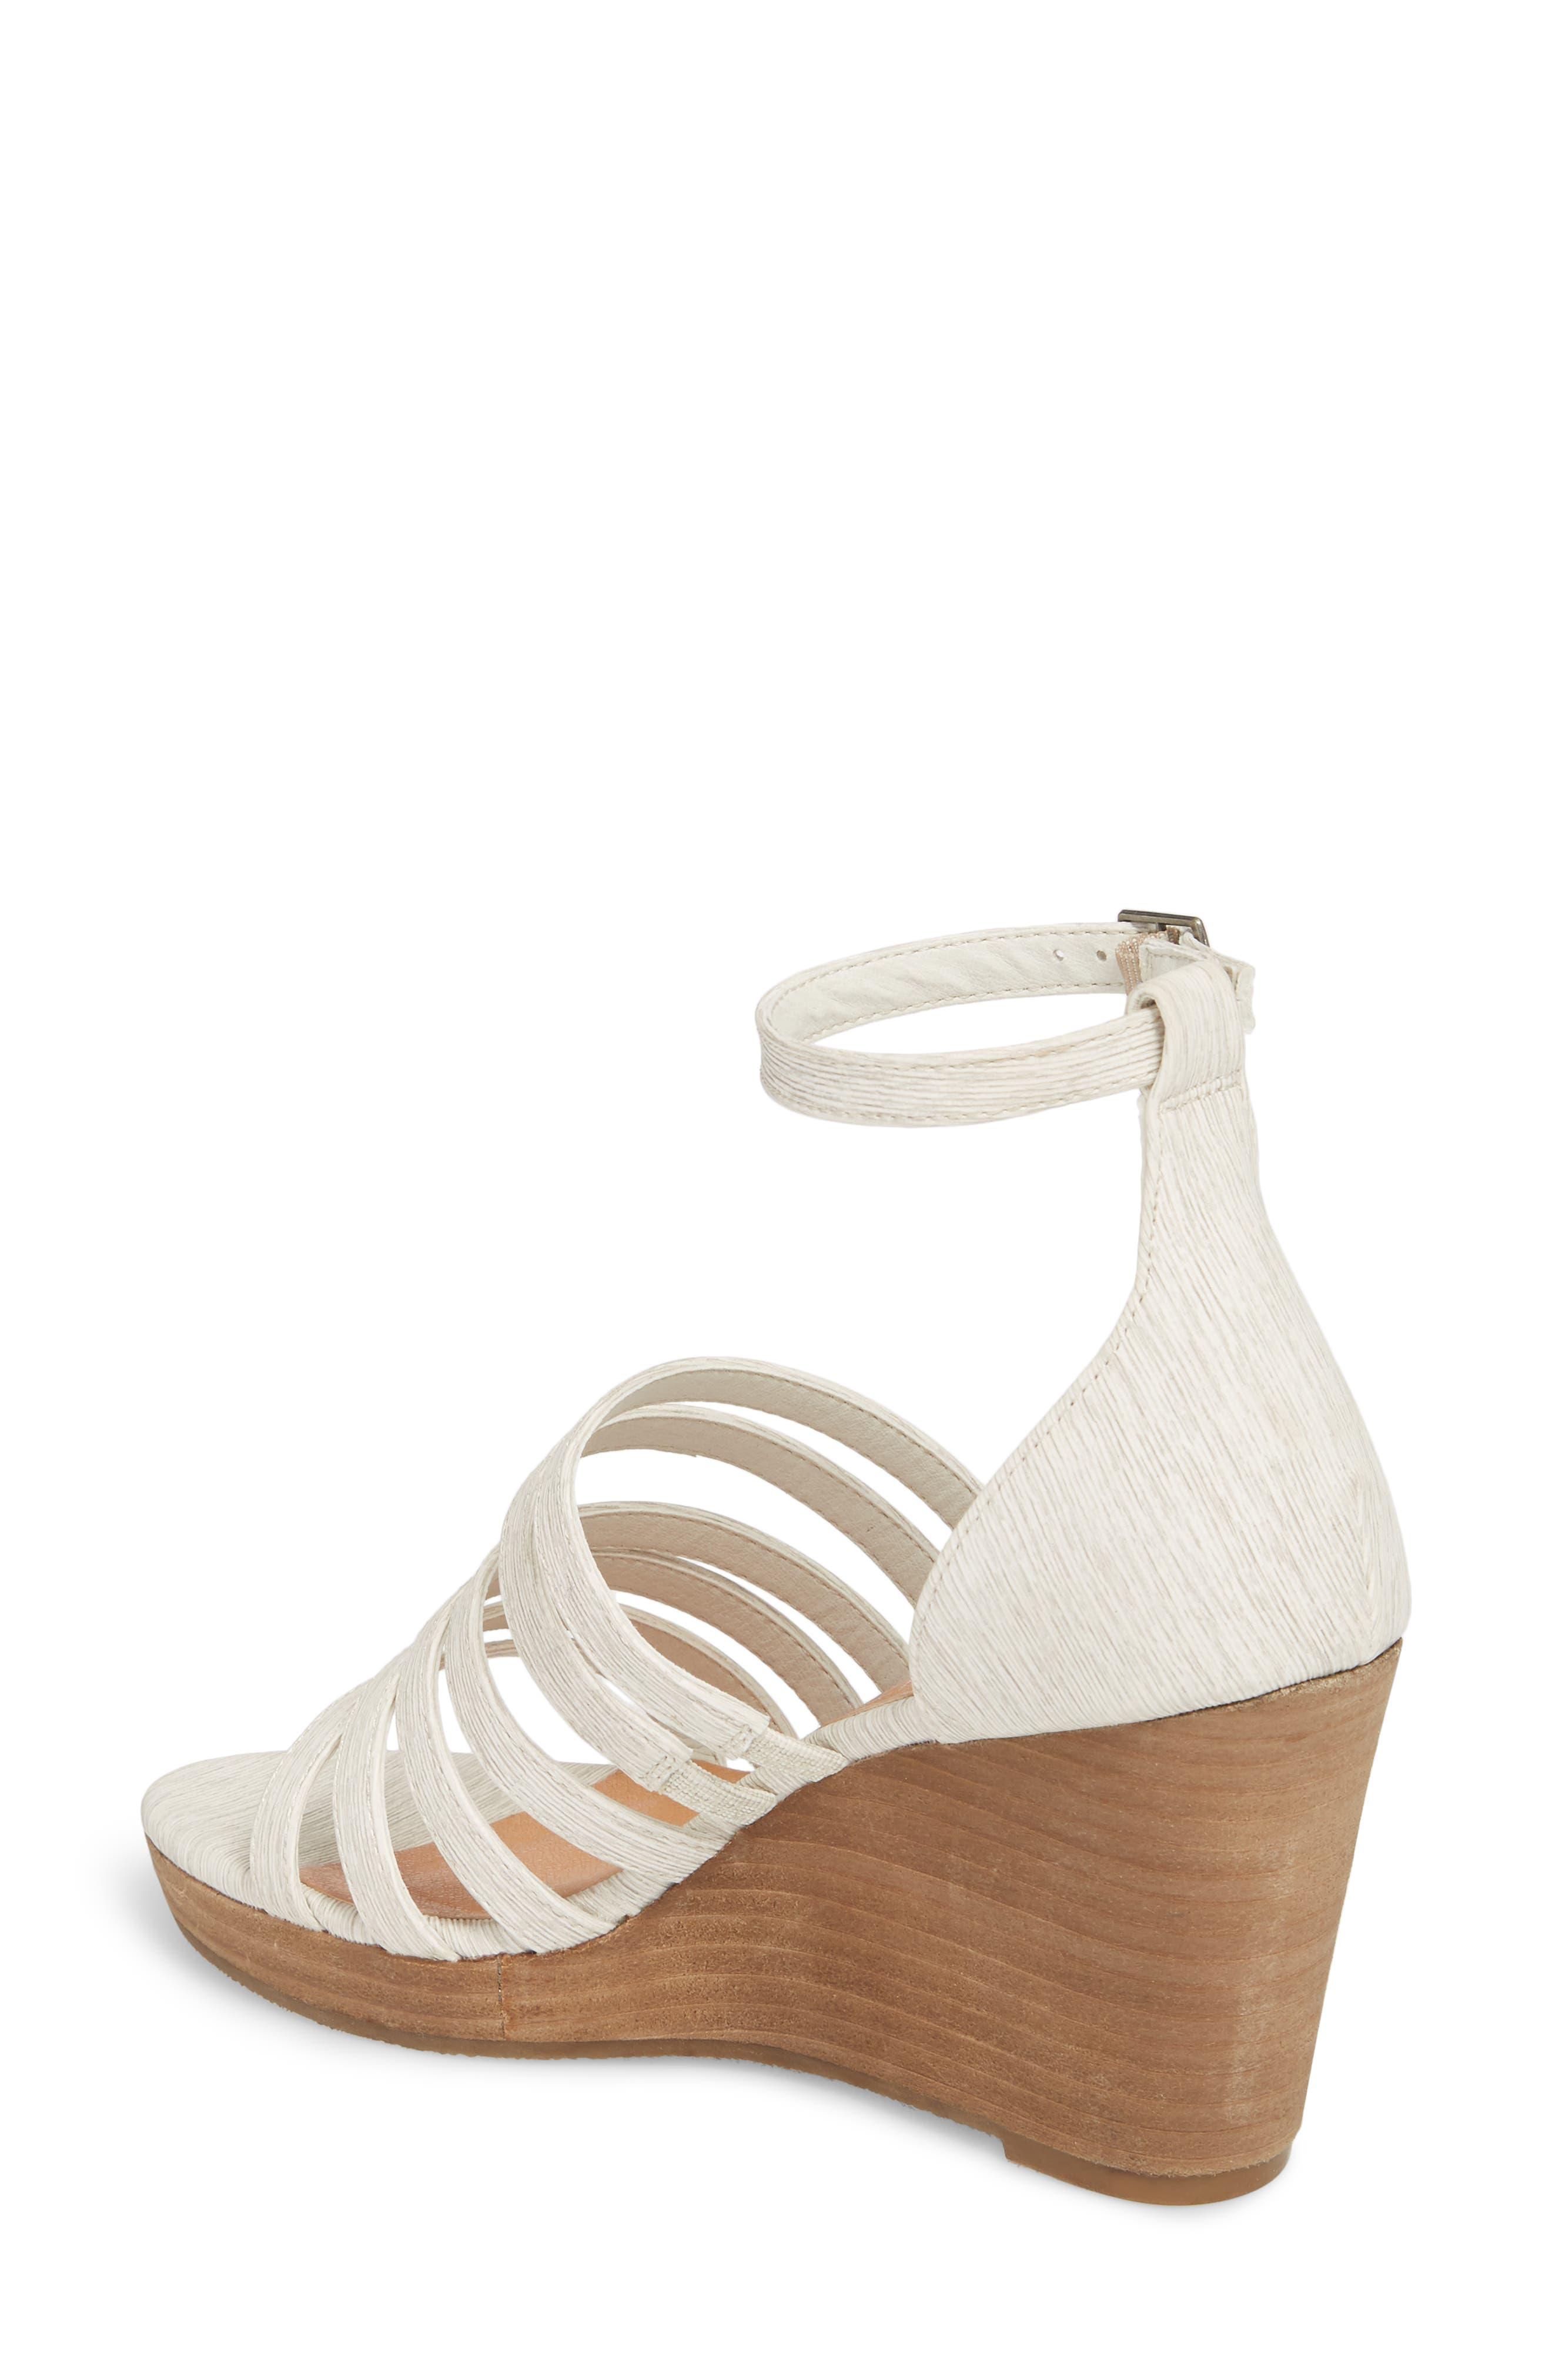 Kiera Wedge Sandal,                             Alternate thumbnail 2, color,                             NATURAL FABRIC